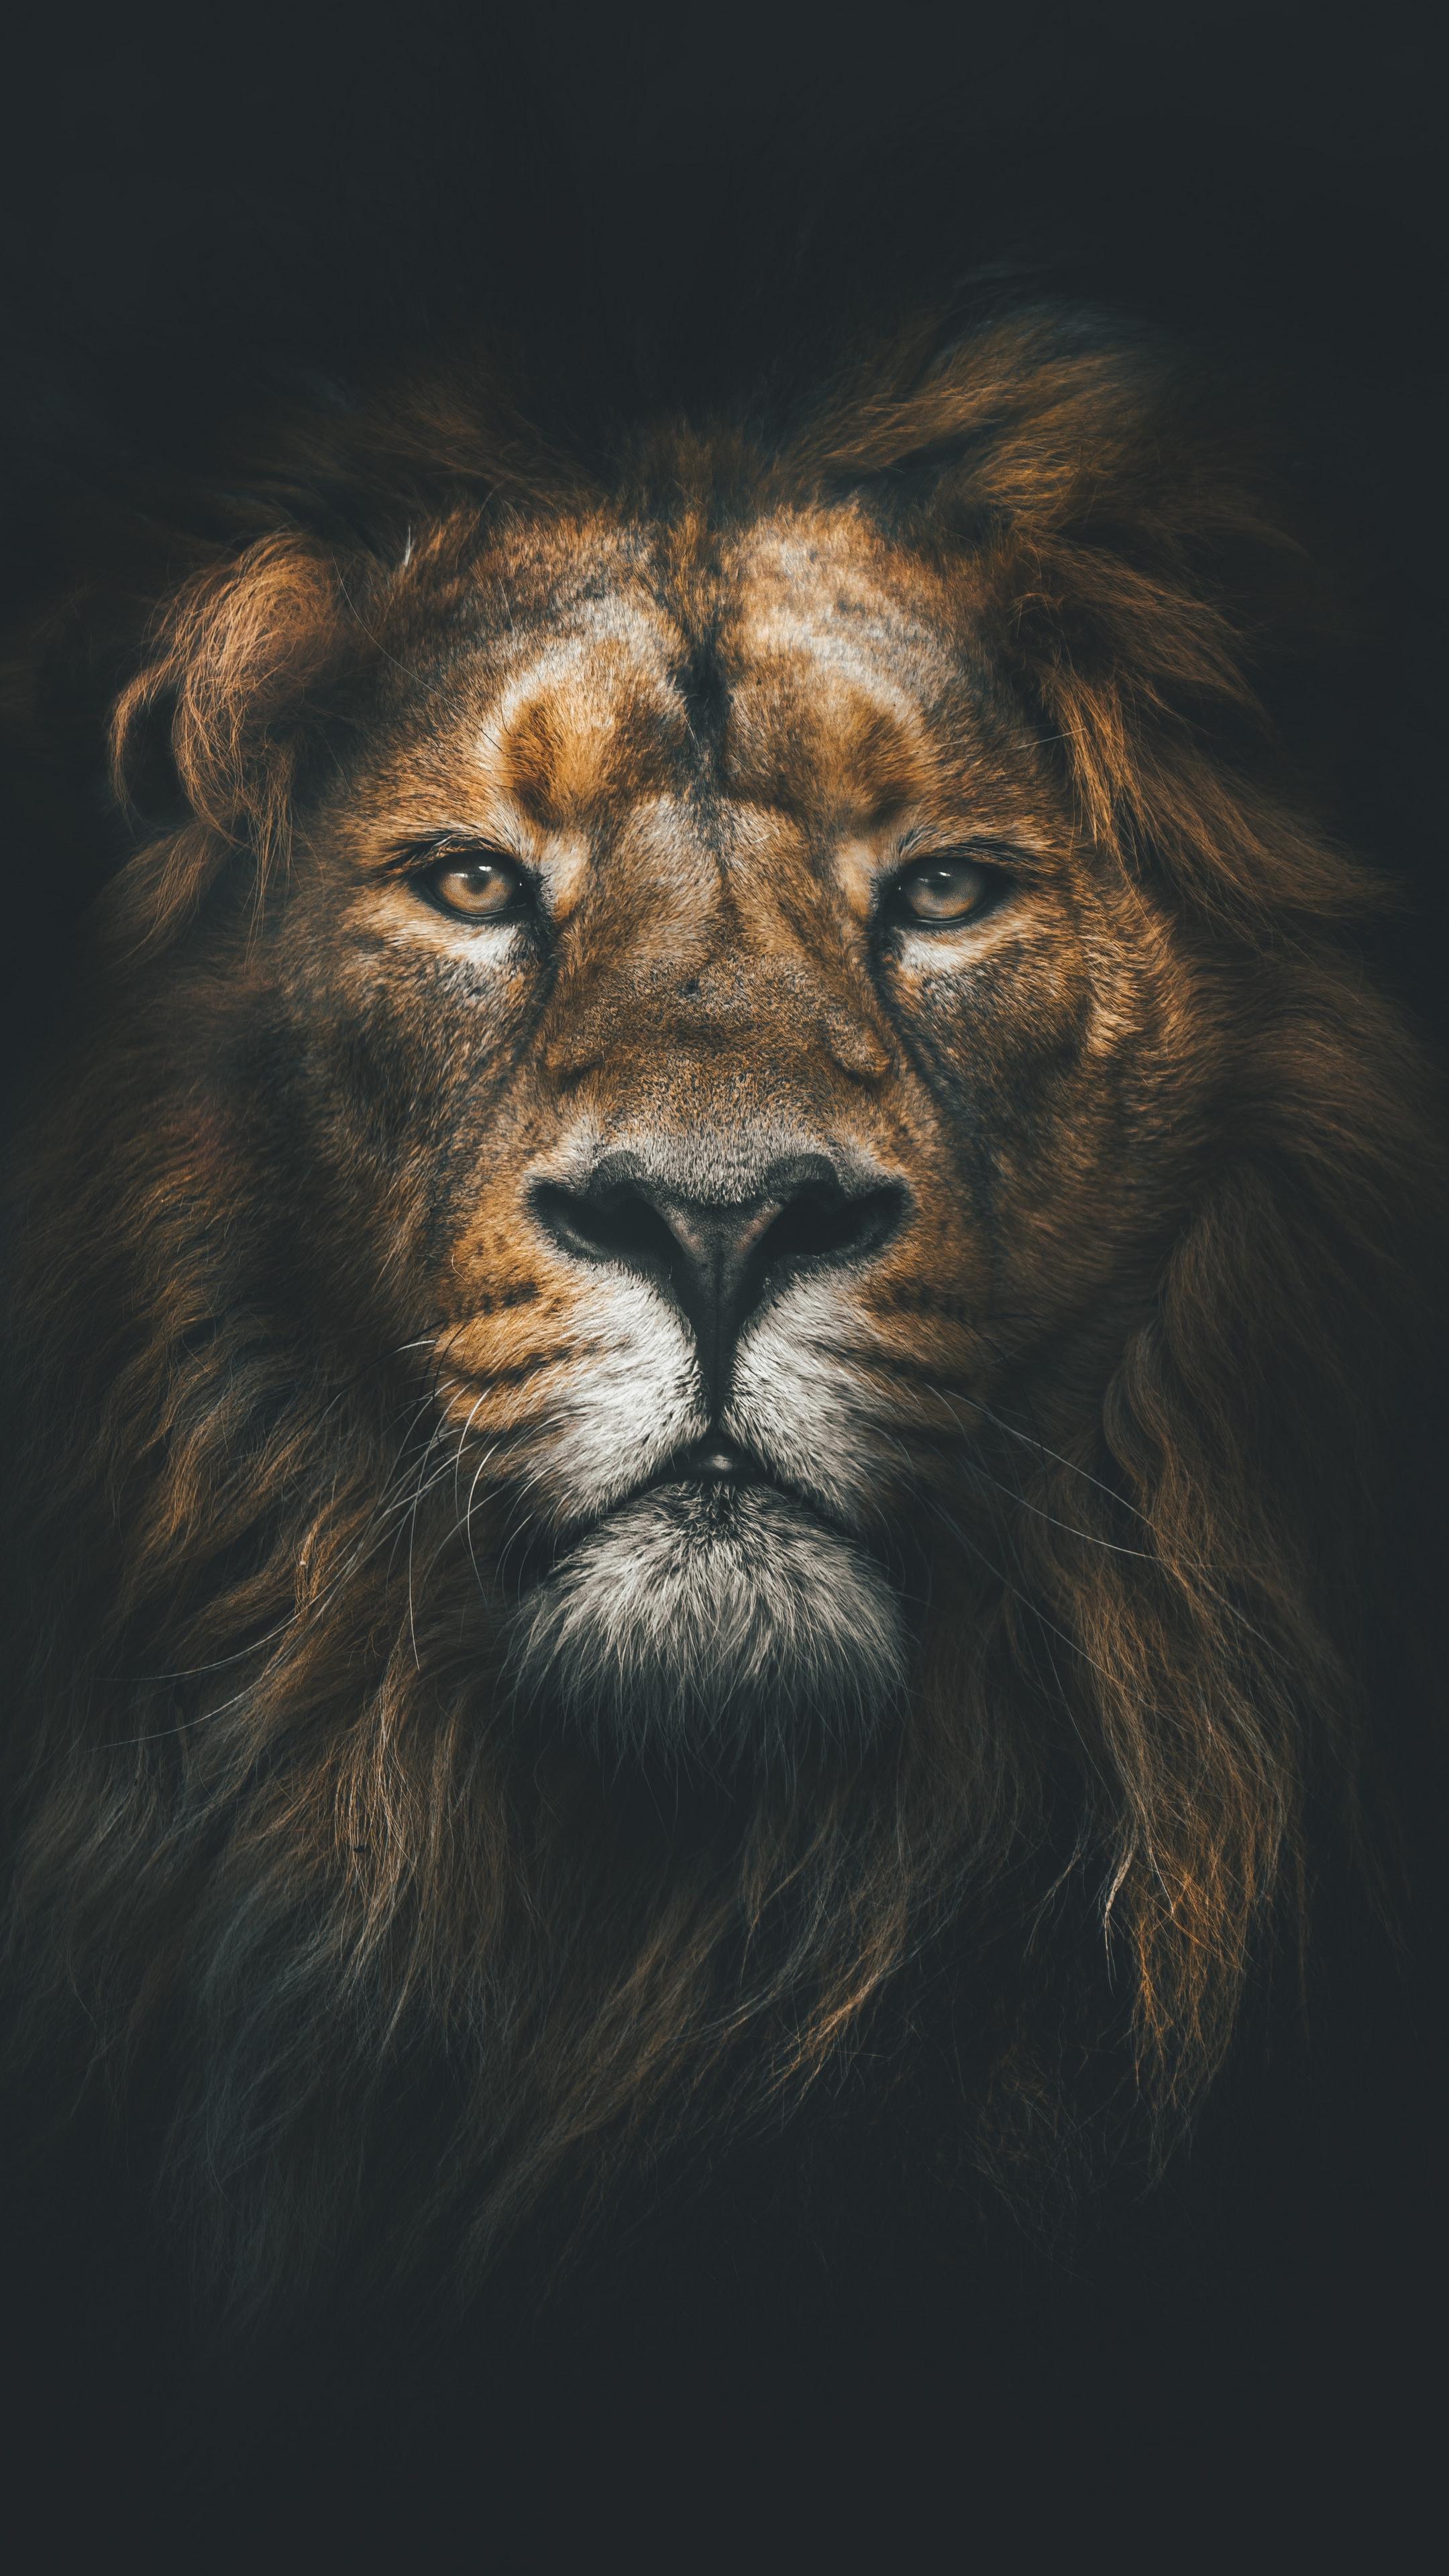 Wallpaper Lion, Muzzle, Mane, Loок, Predator - Iphone 7 Wallpaper Lion - HD Wallpaper